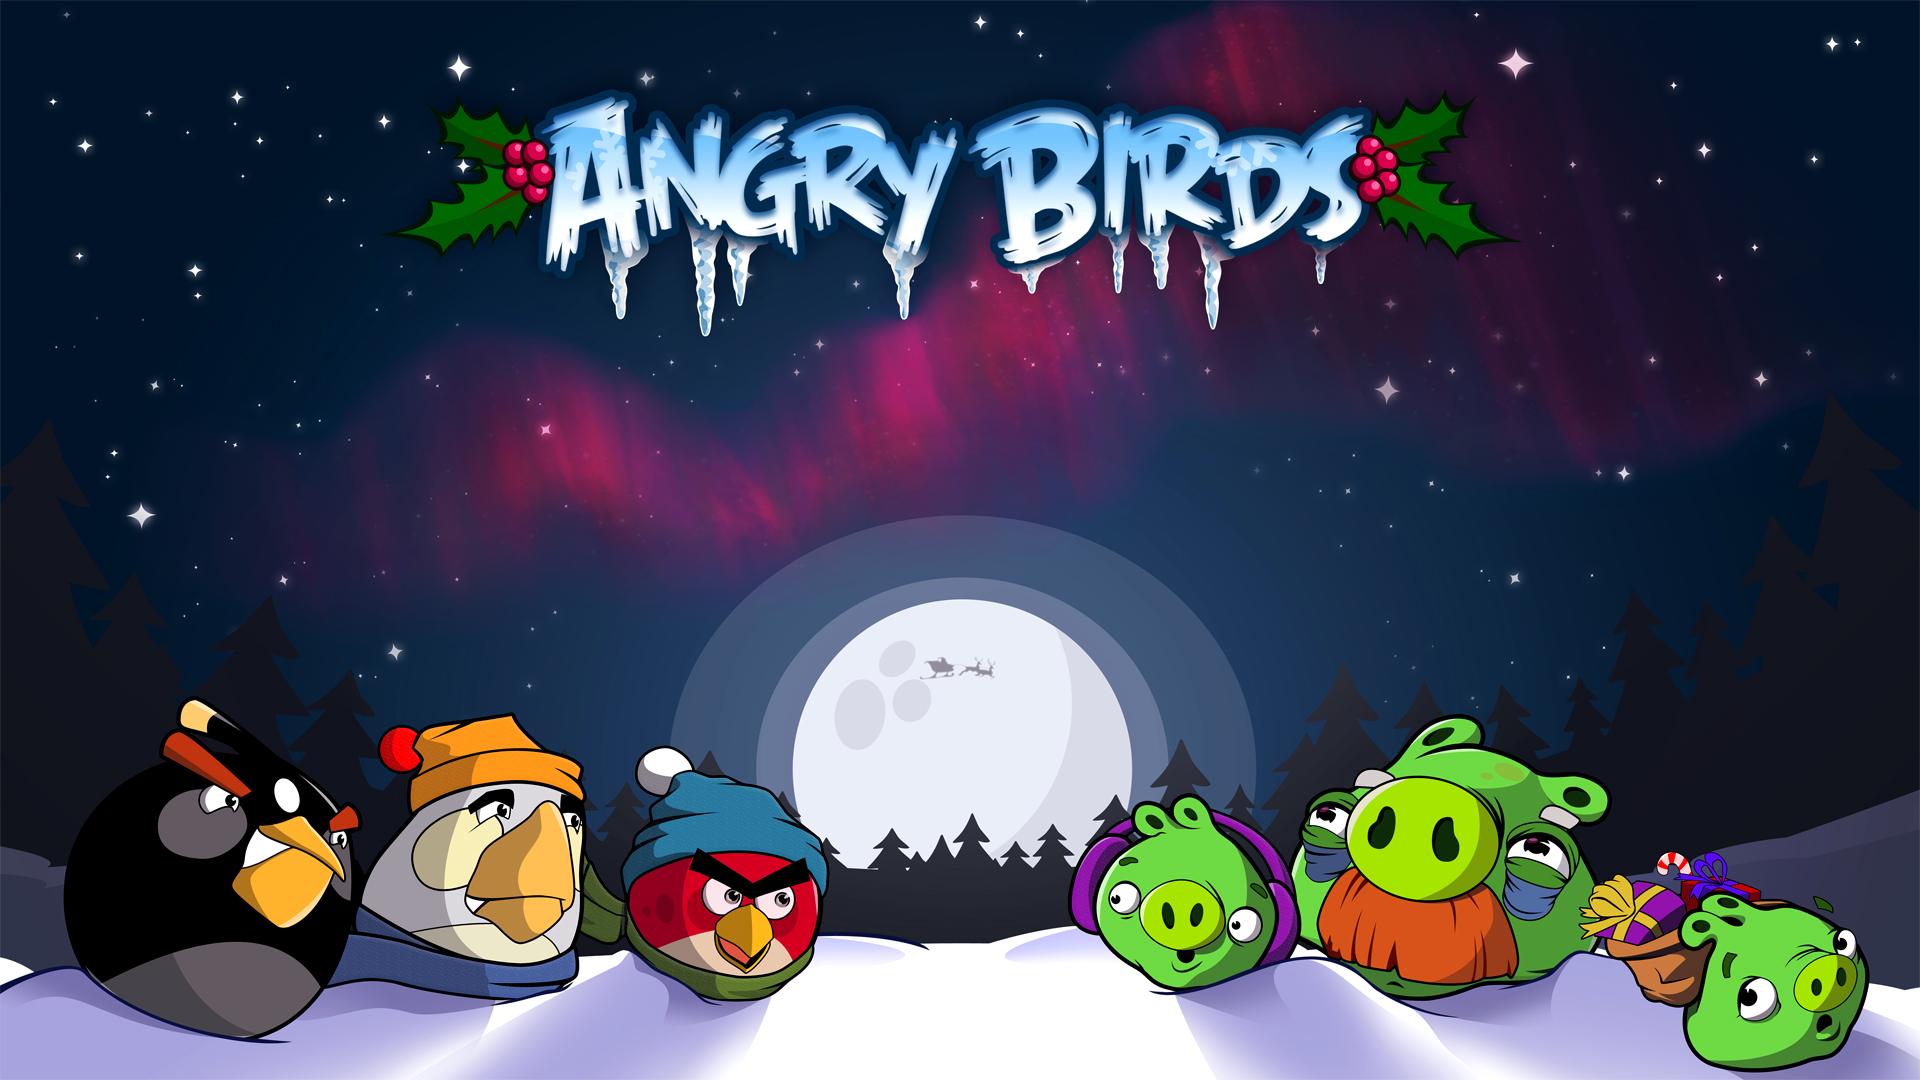 Angry Birds Wallpaper 1 300x168 Angry Birds Wallpaper (1)